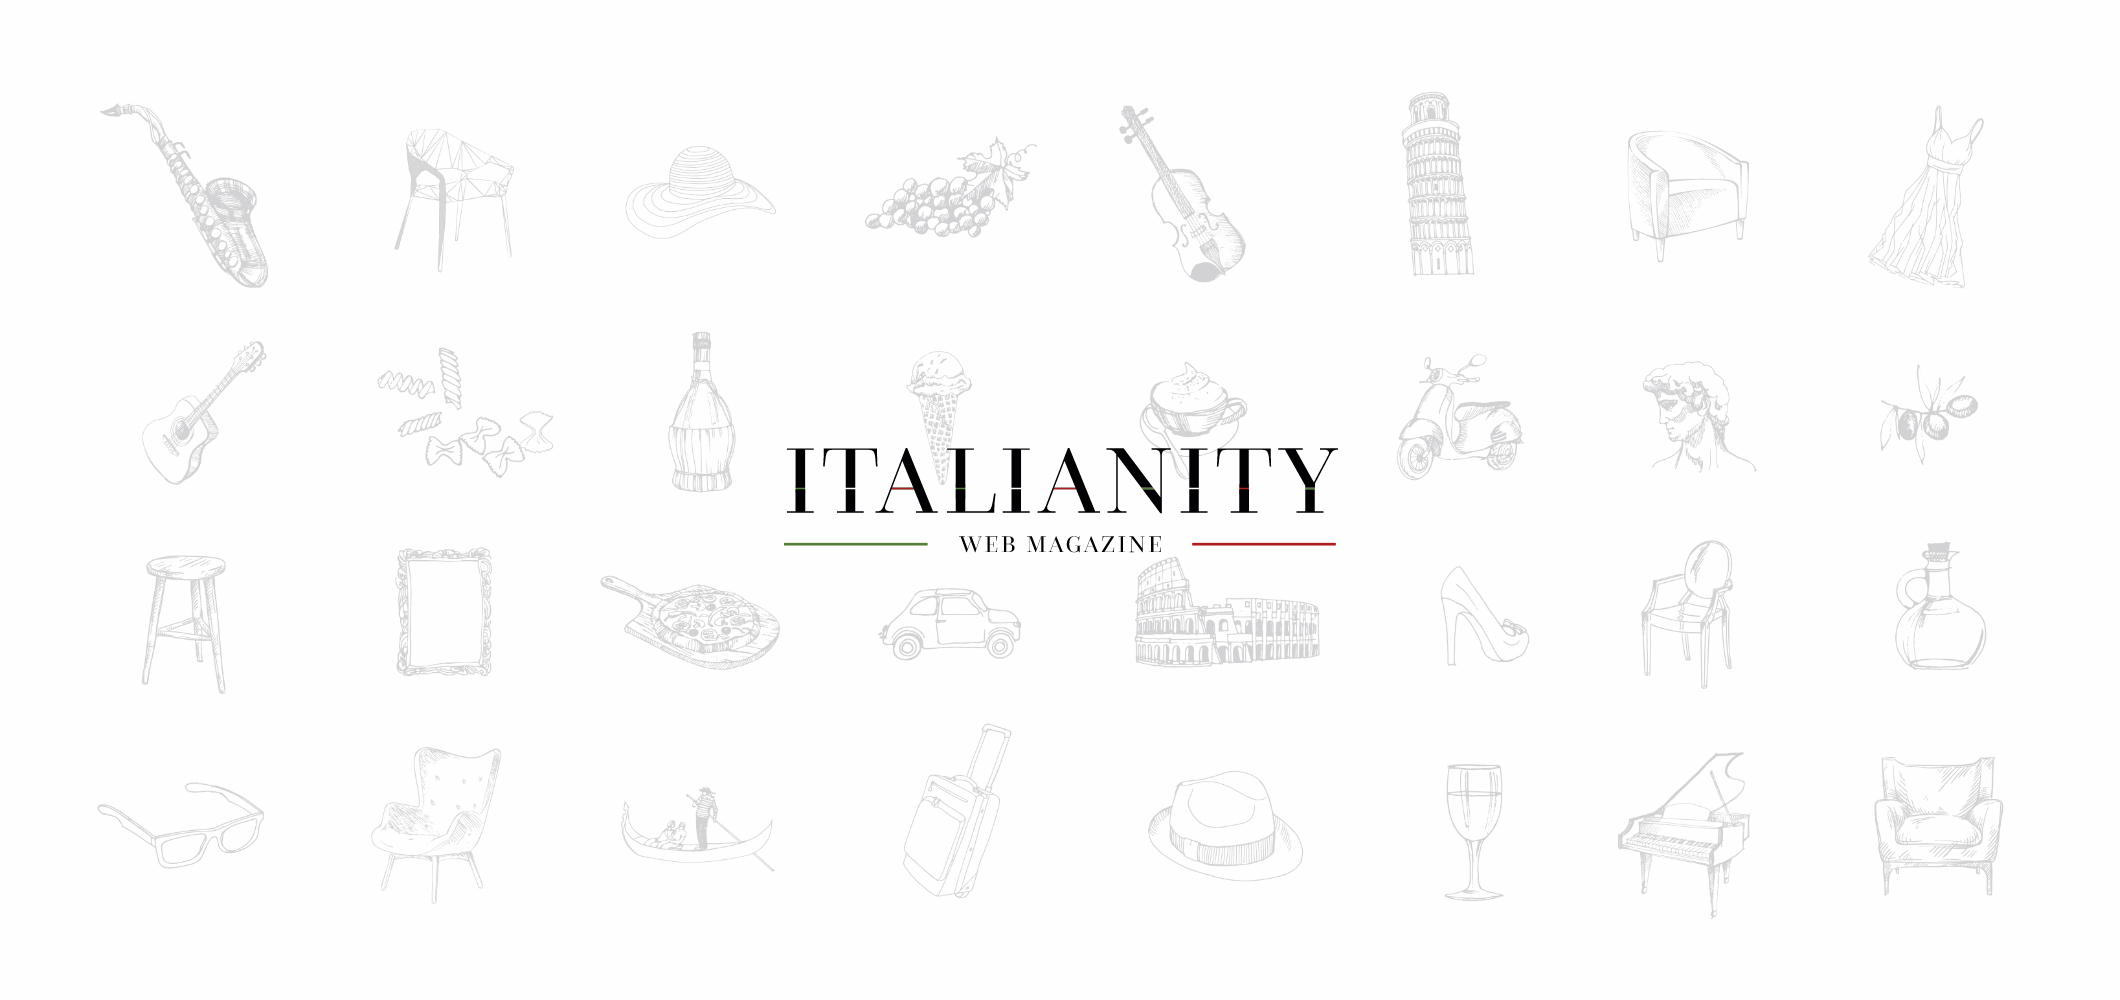 ITALIANITY